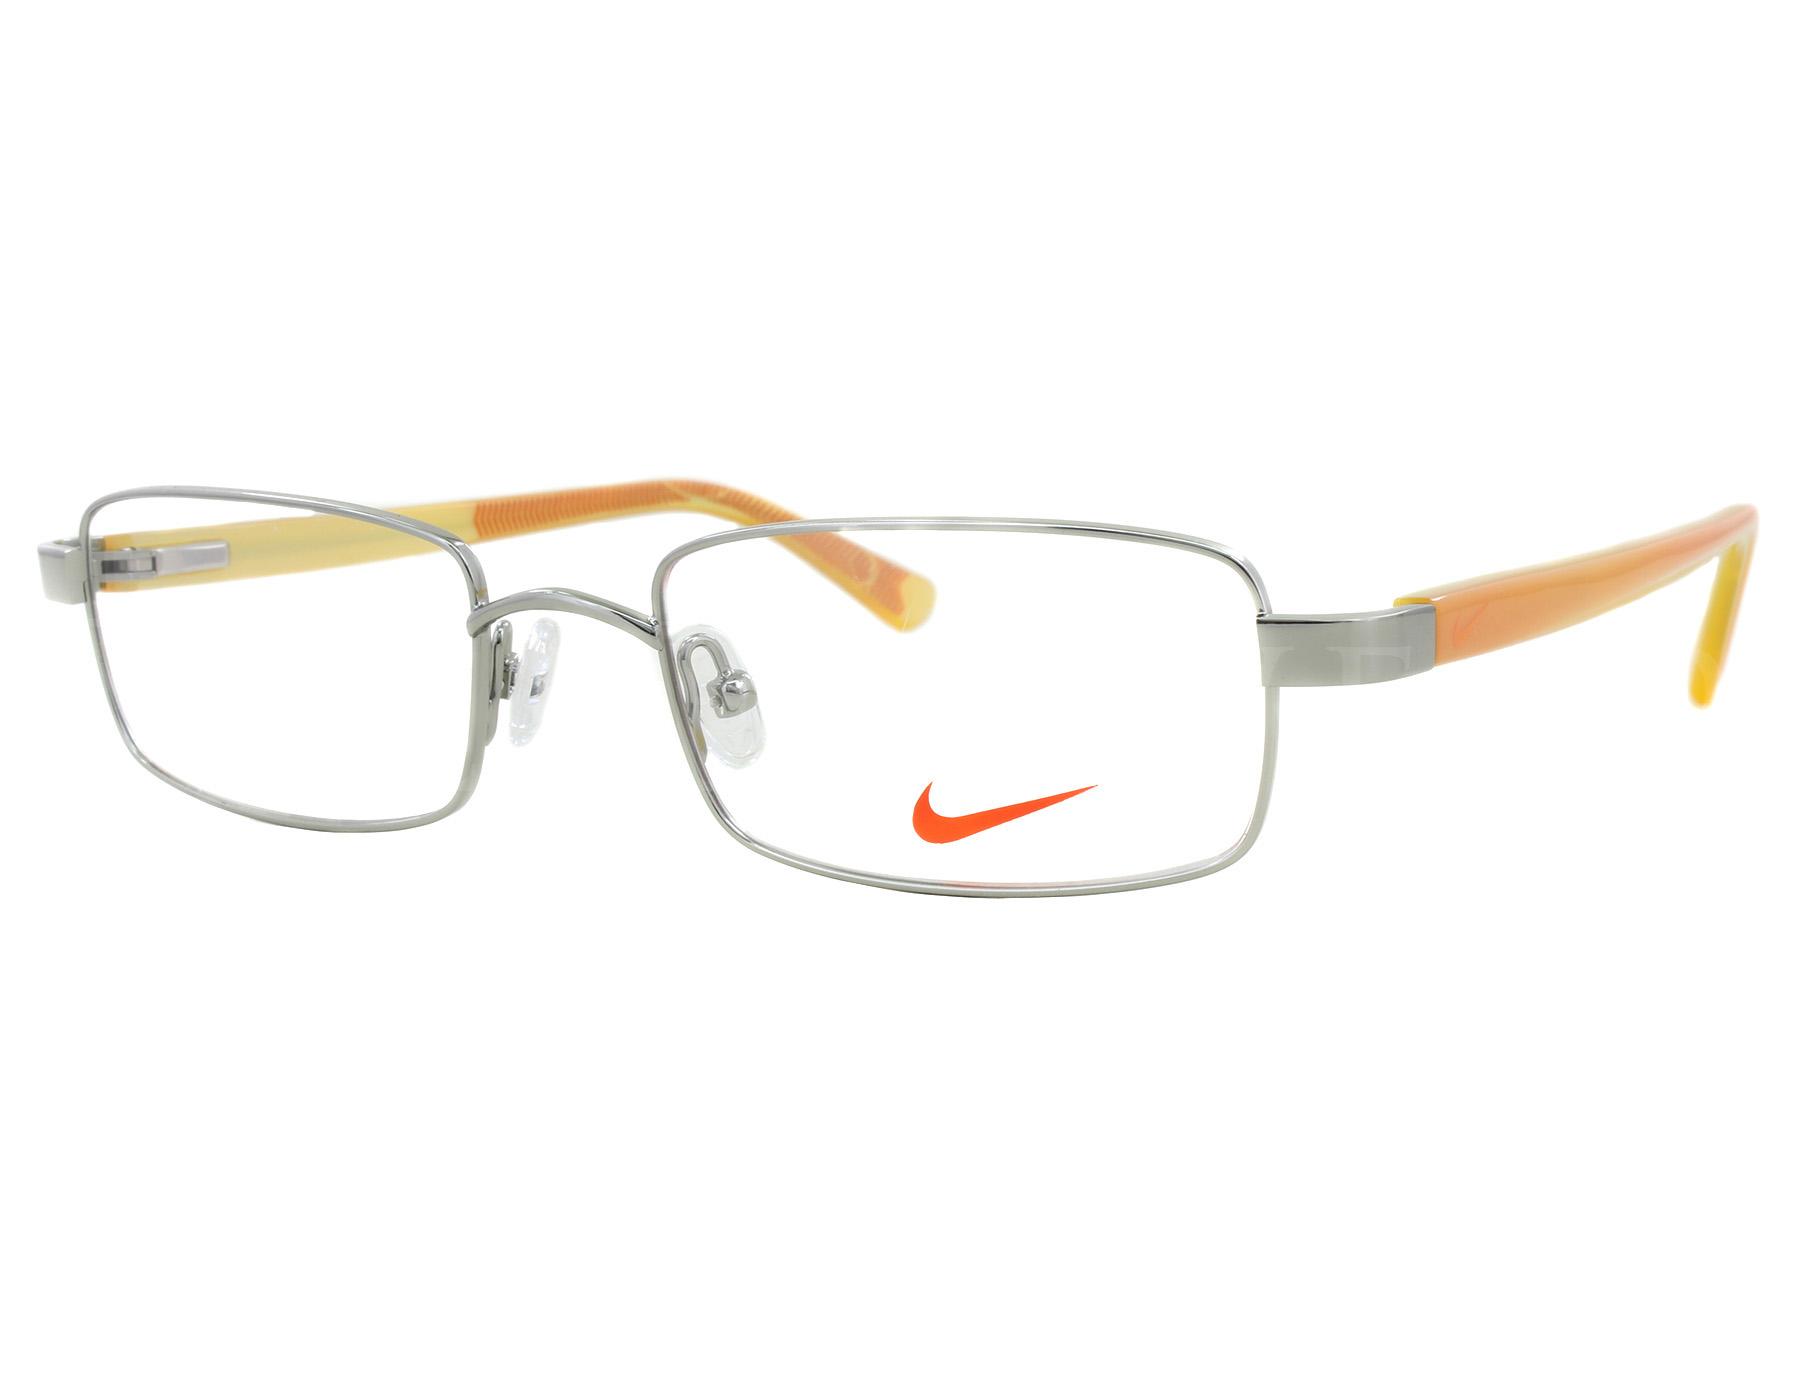 e660d3ec27e6 Details about NEW Nike NK 5550 045 49mm Steel Orange Optical Eyeglasses  Frames